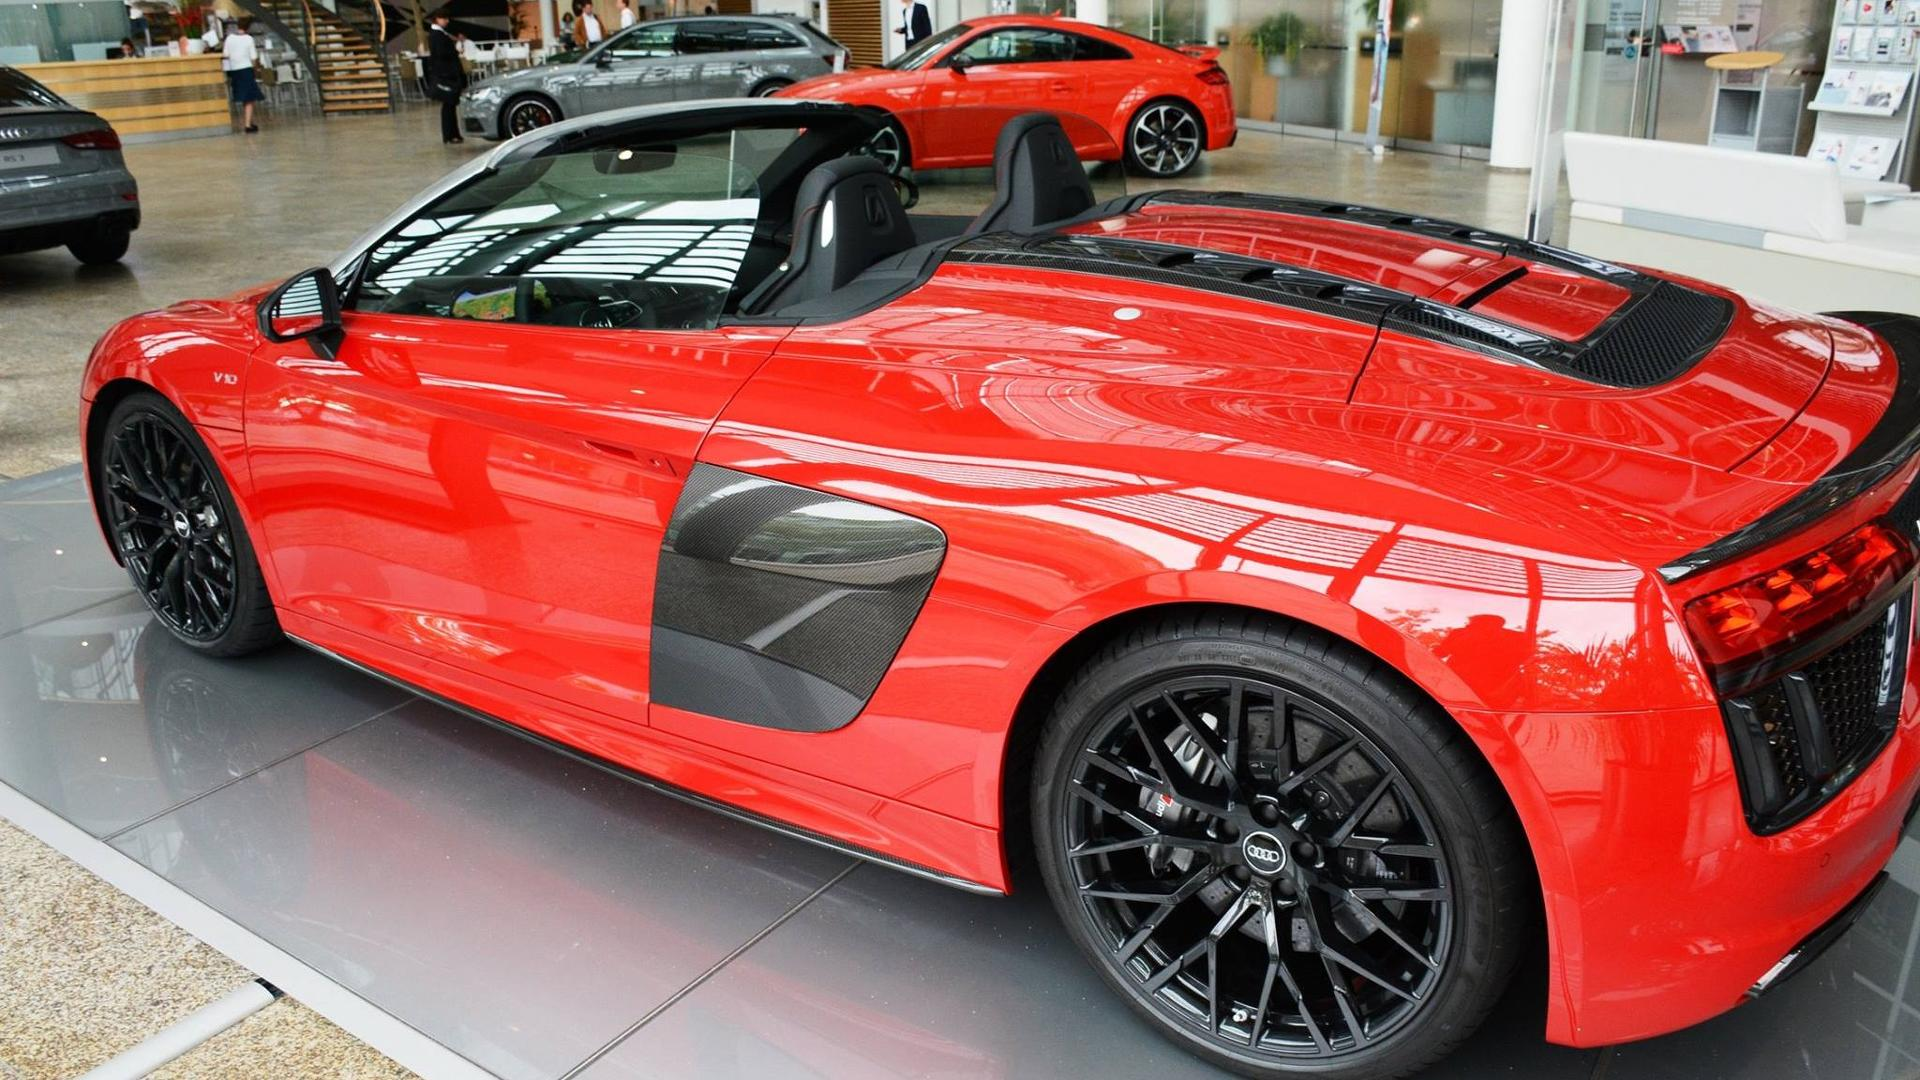 Audi R8 Spyder V10 Plus Ad Might Make You Dizzy